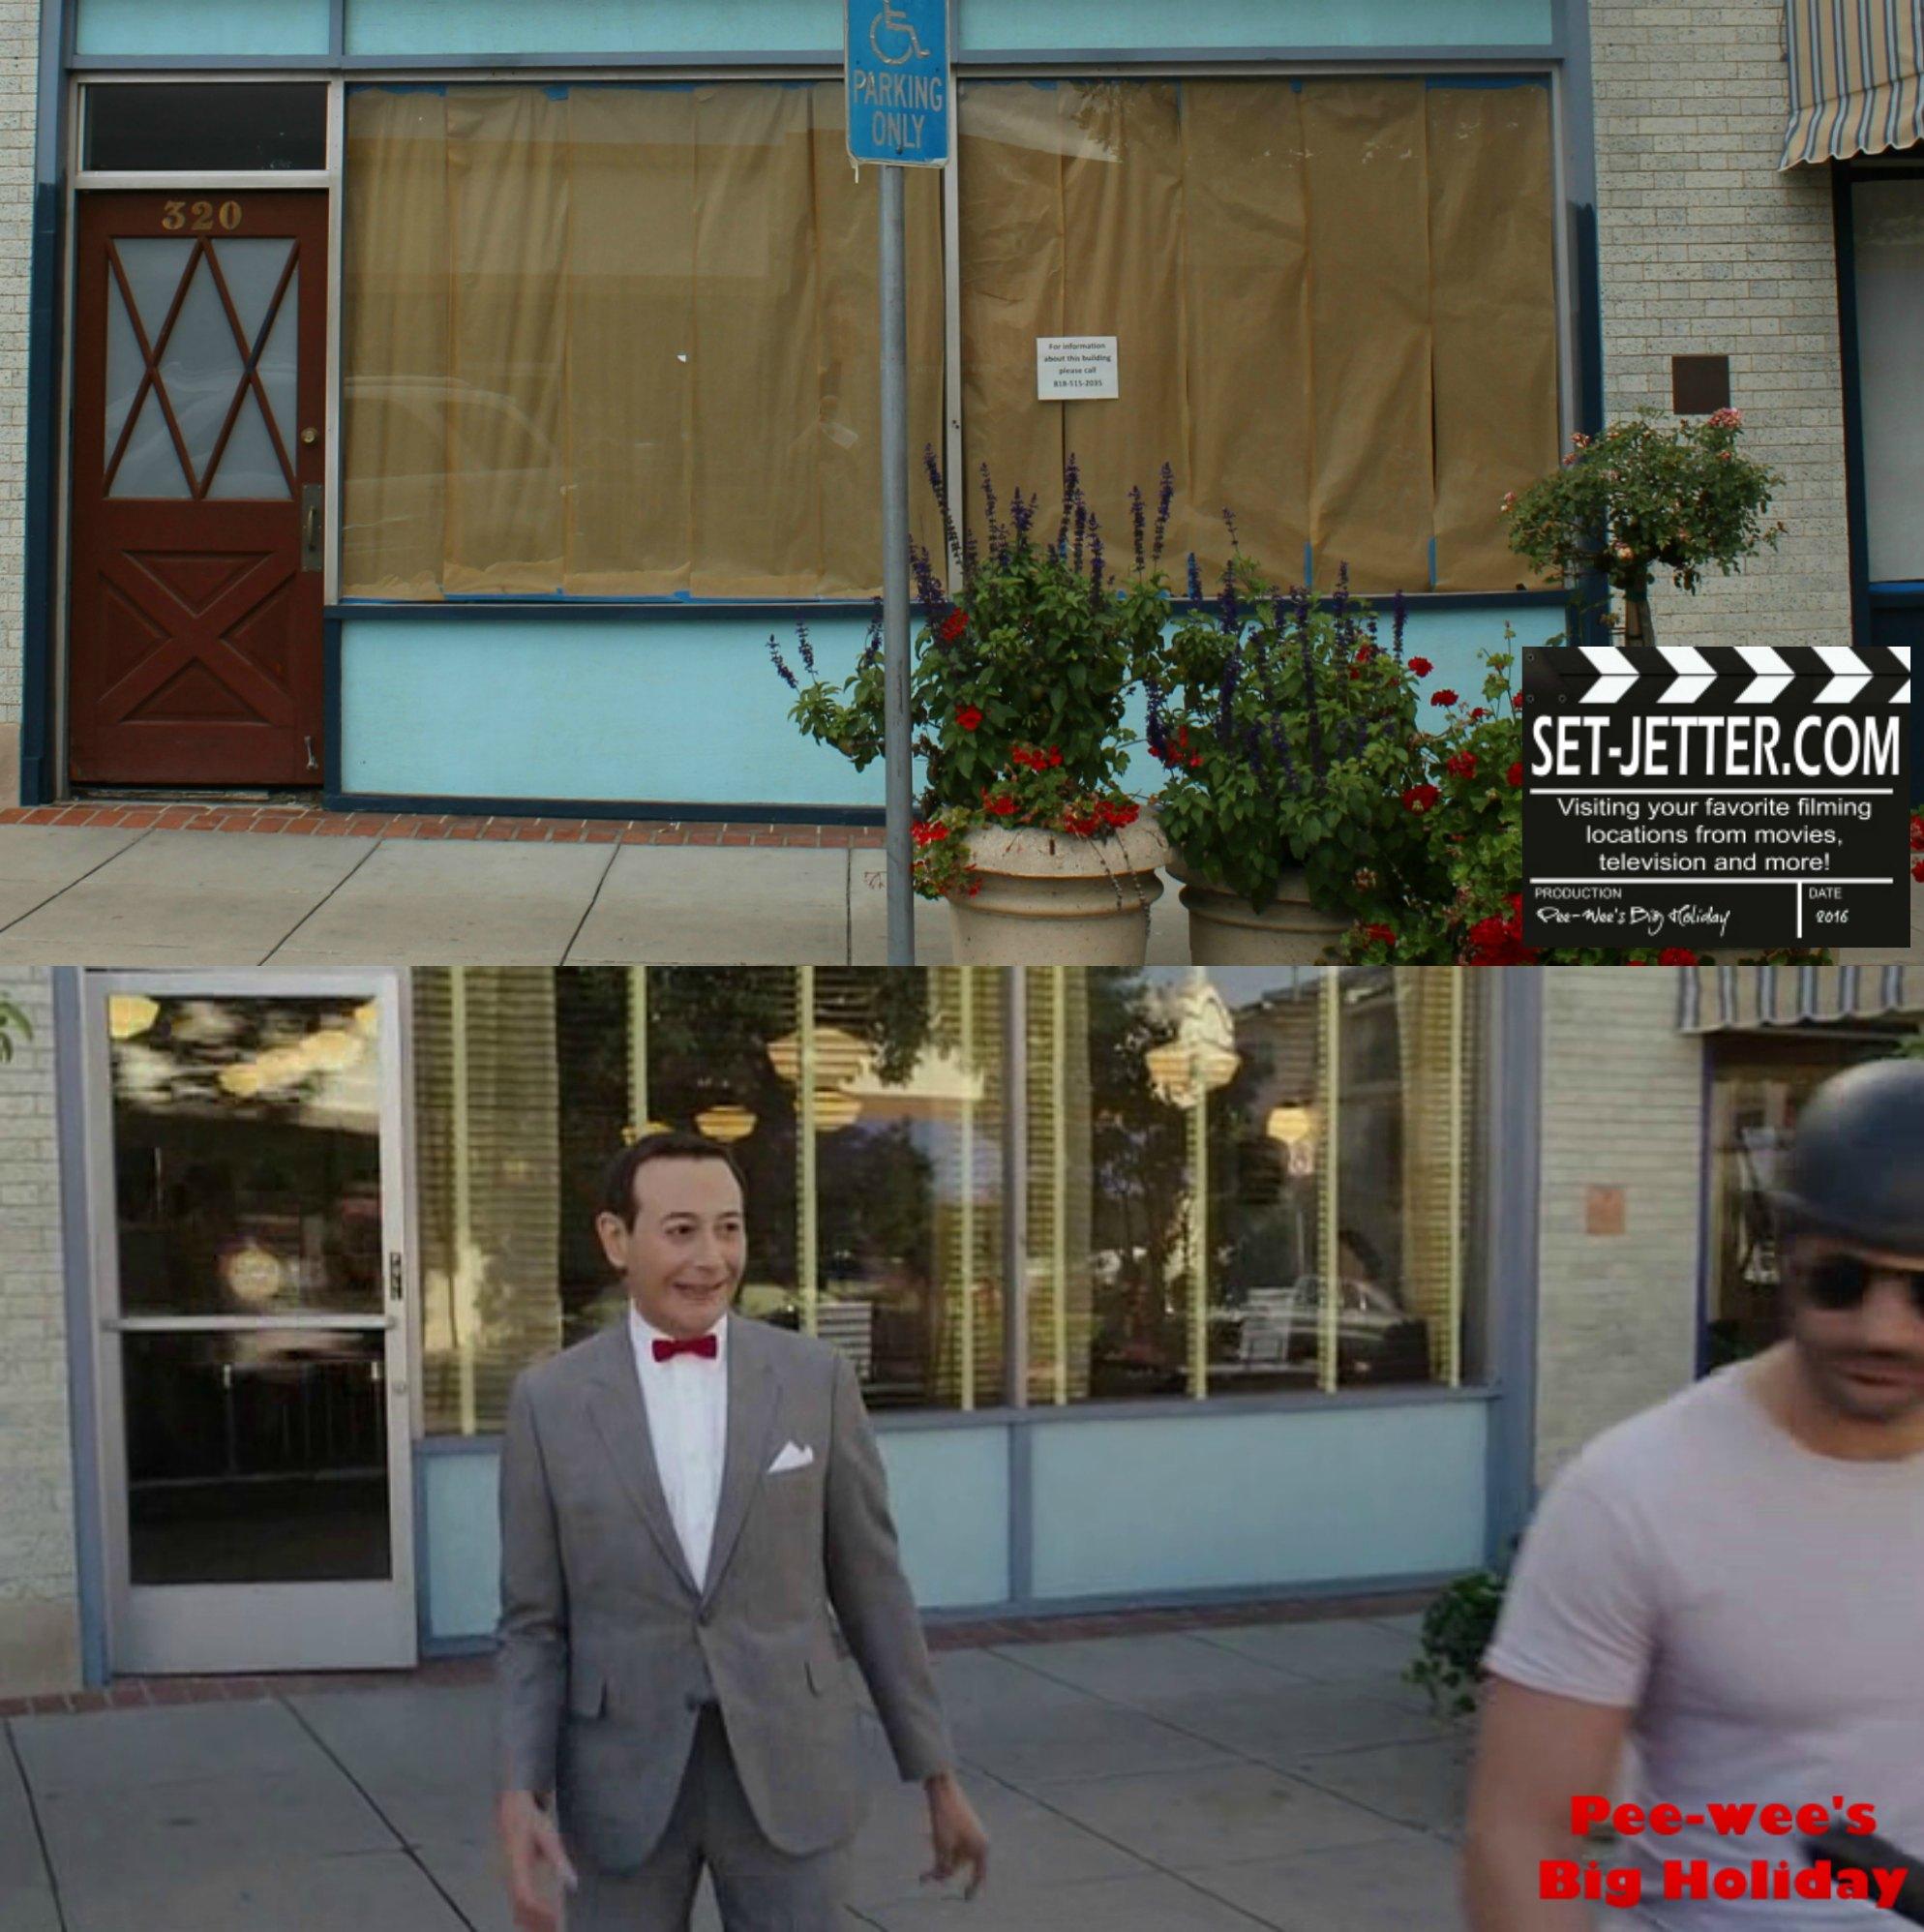 Pee Wee's Big Holiday comparison 365.jpg